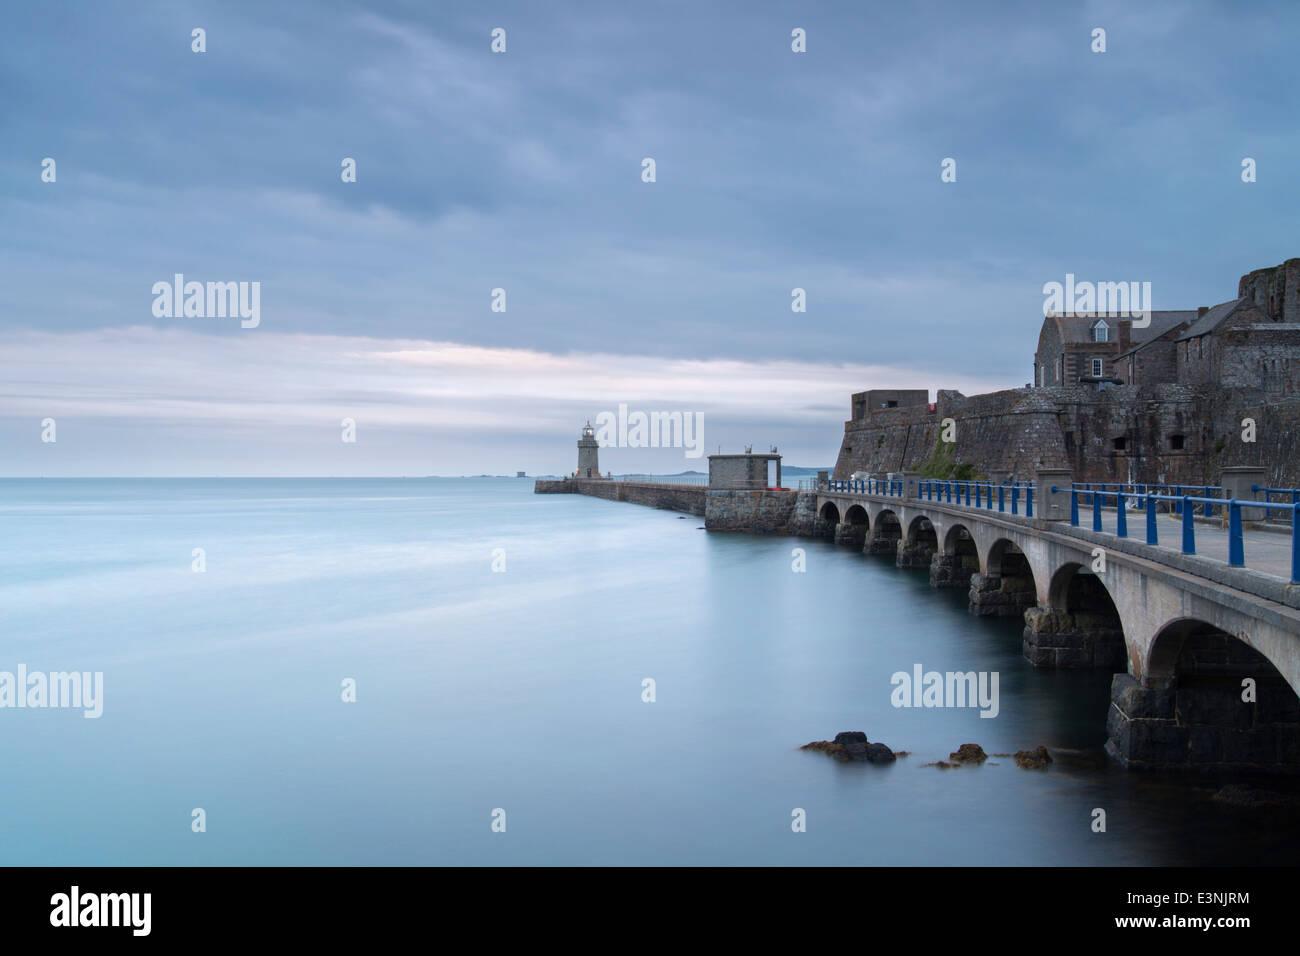 Castle Cornet St Peter Port Guernsey - Stock Image